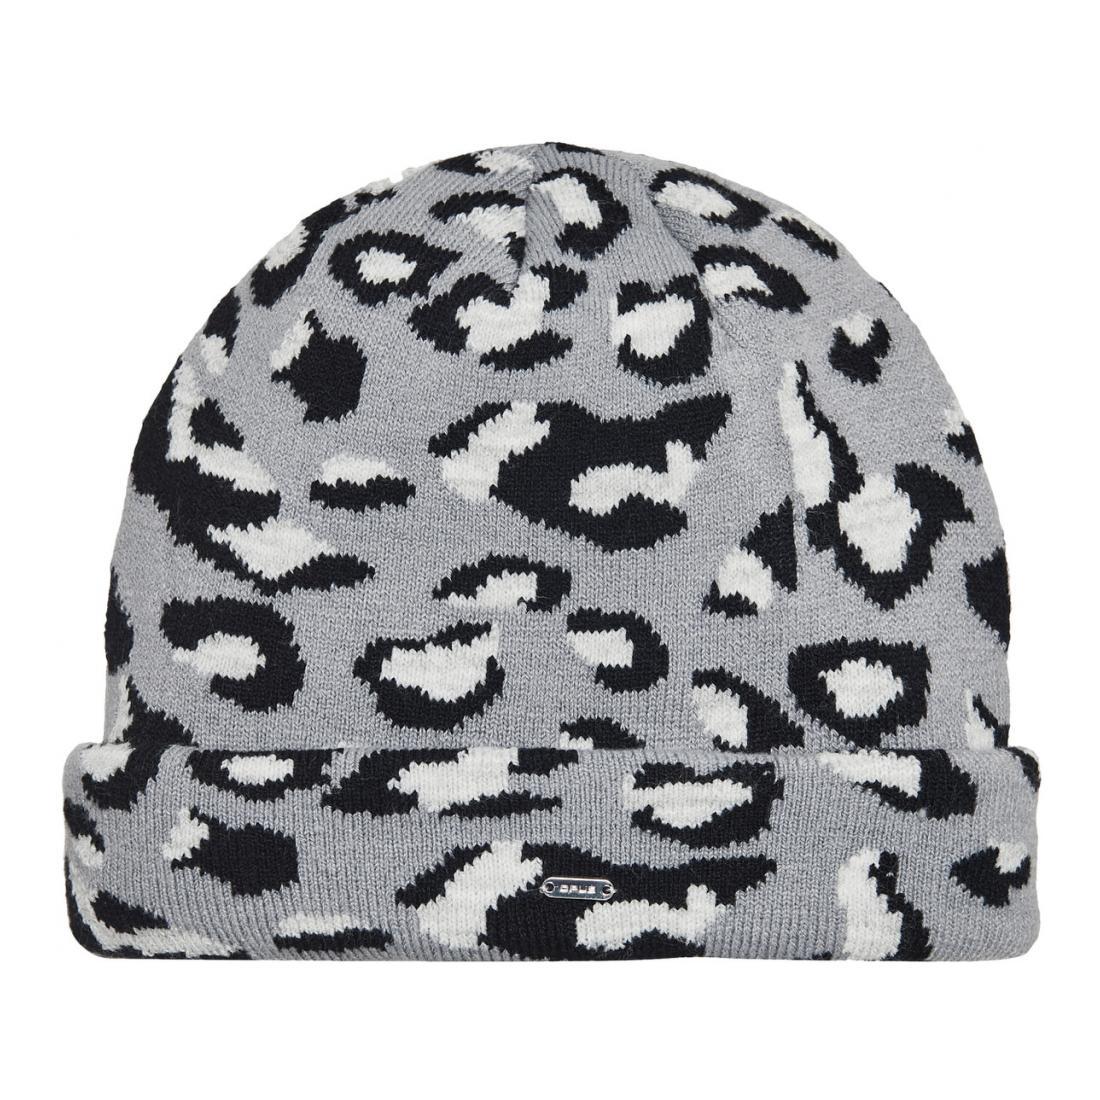 Opus Mützen Stirnband/Handschuhe Aleo cap